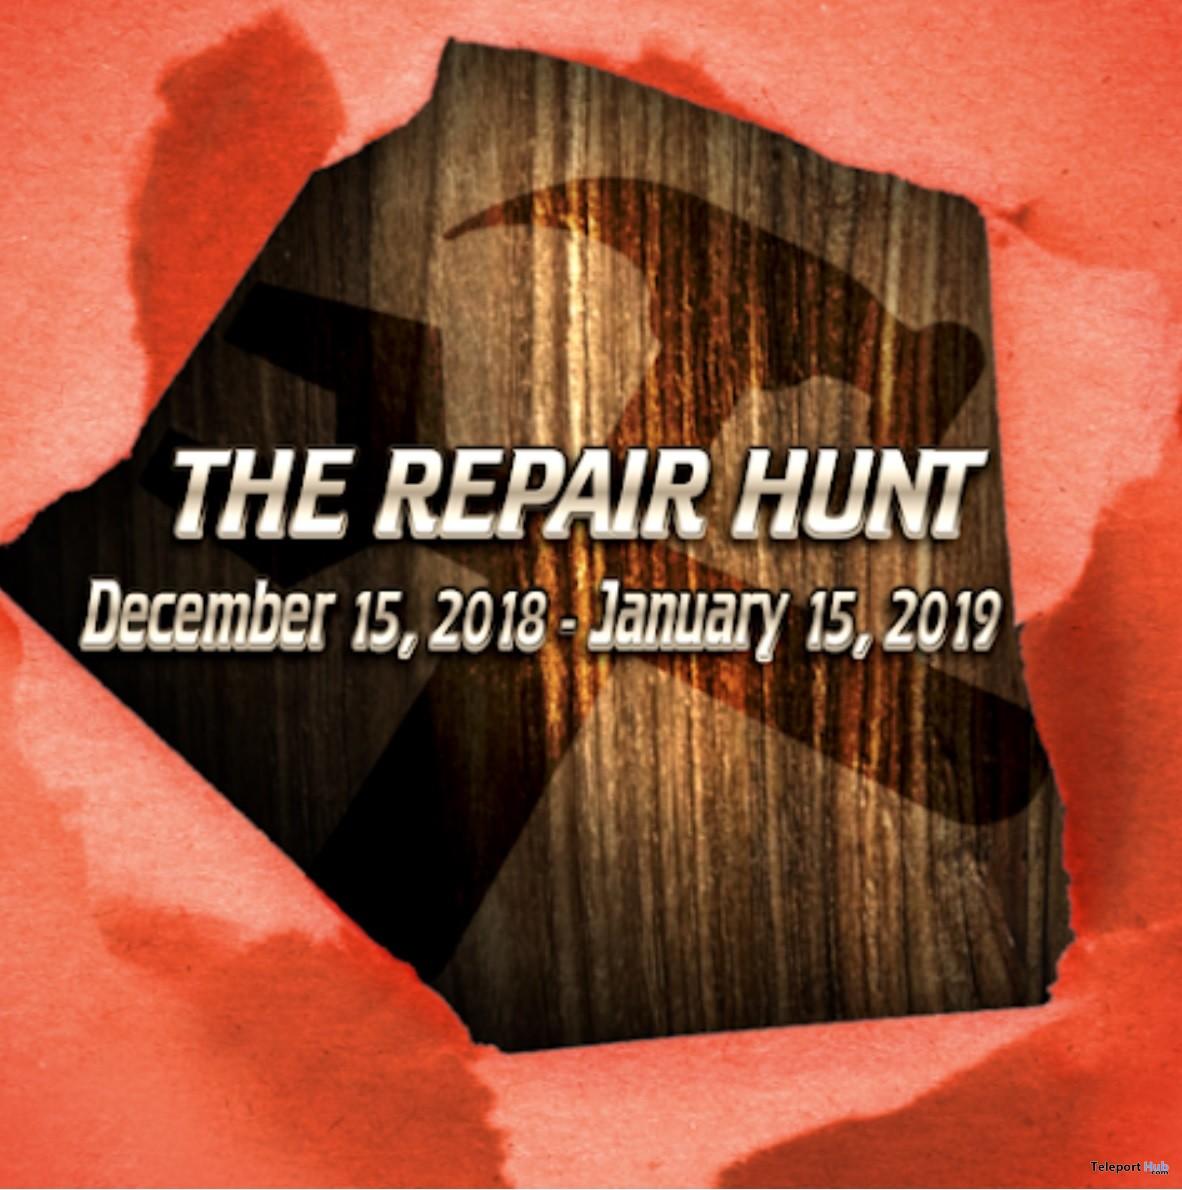 The Repair Hunt 2018 - Teleport Hub - teleporthub.com